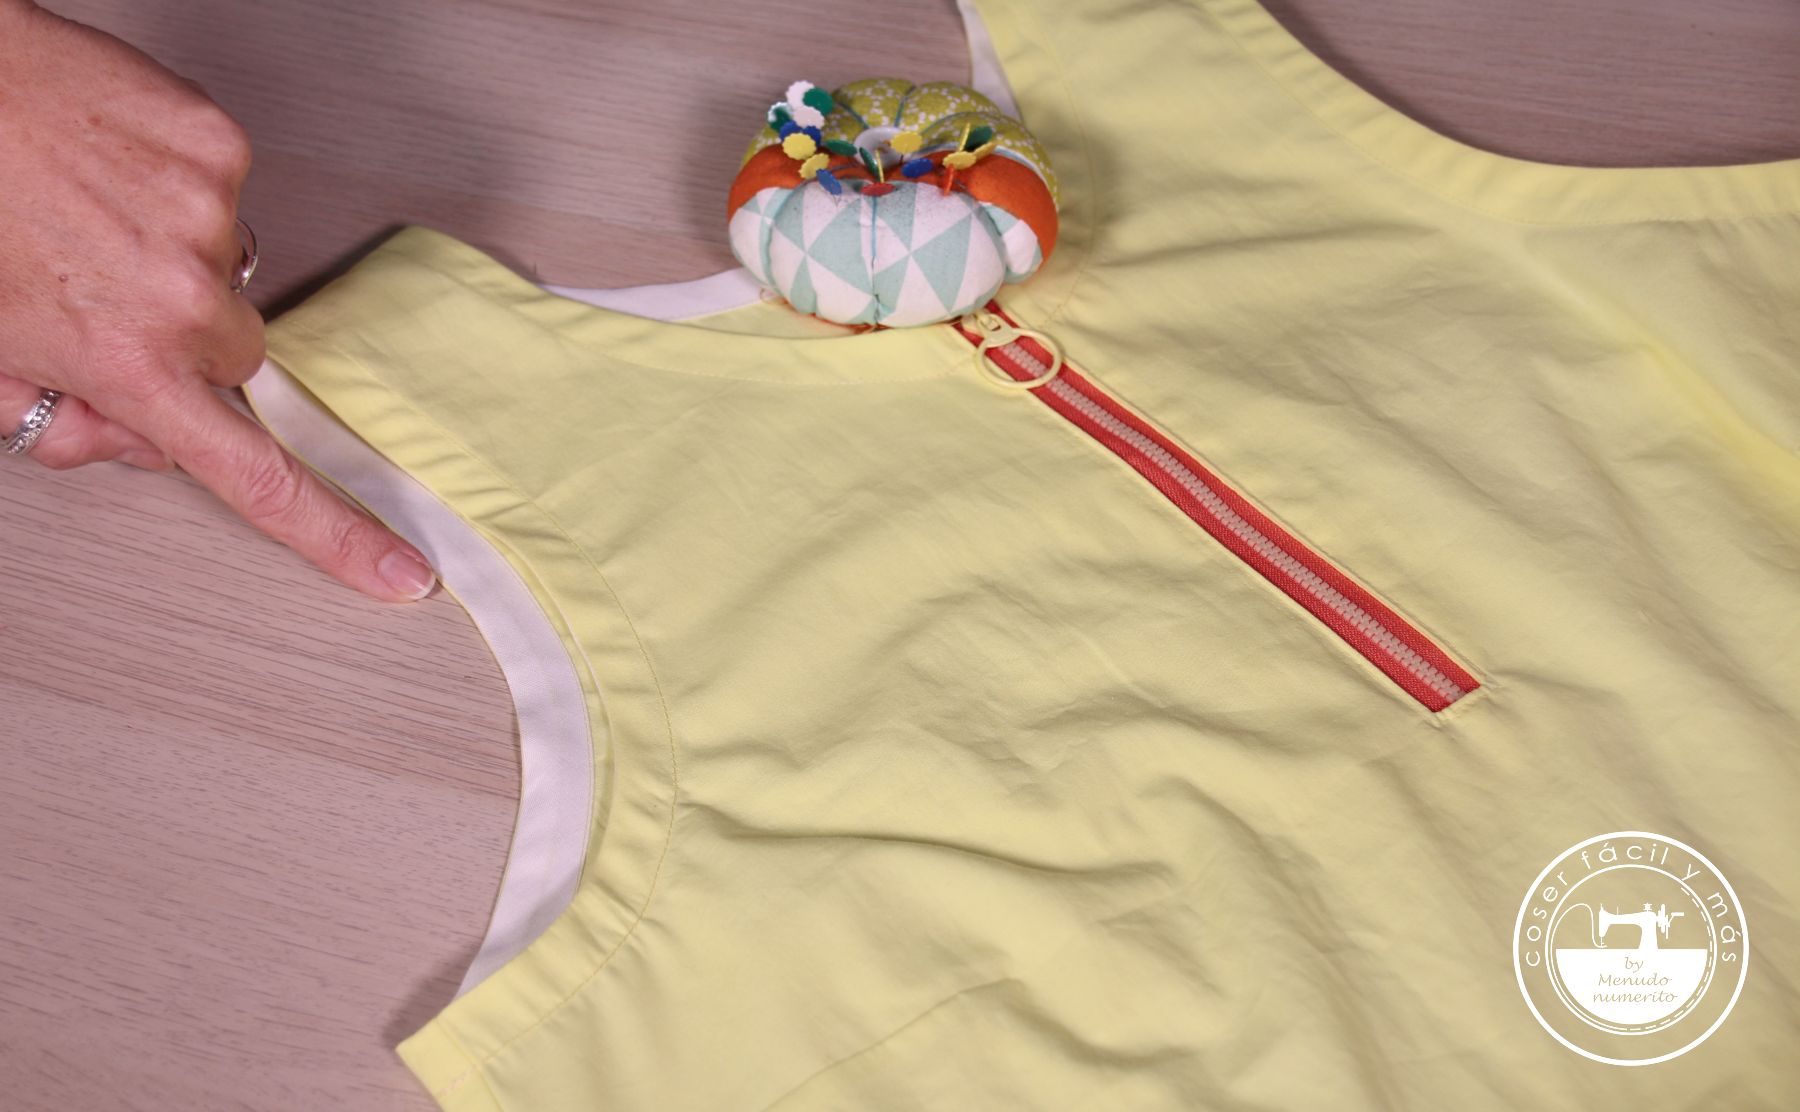 rematar sisas con bies sesgo pulir coser facil blogs de costura